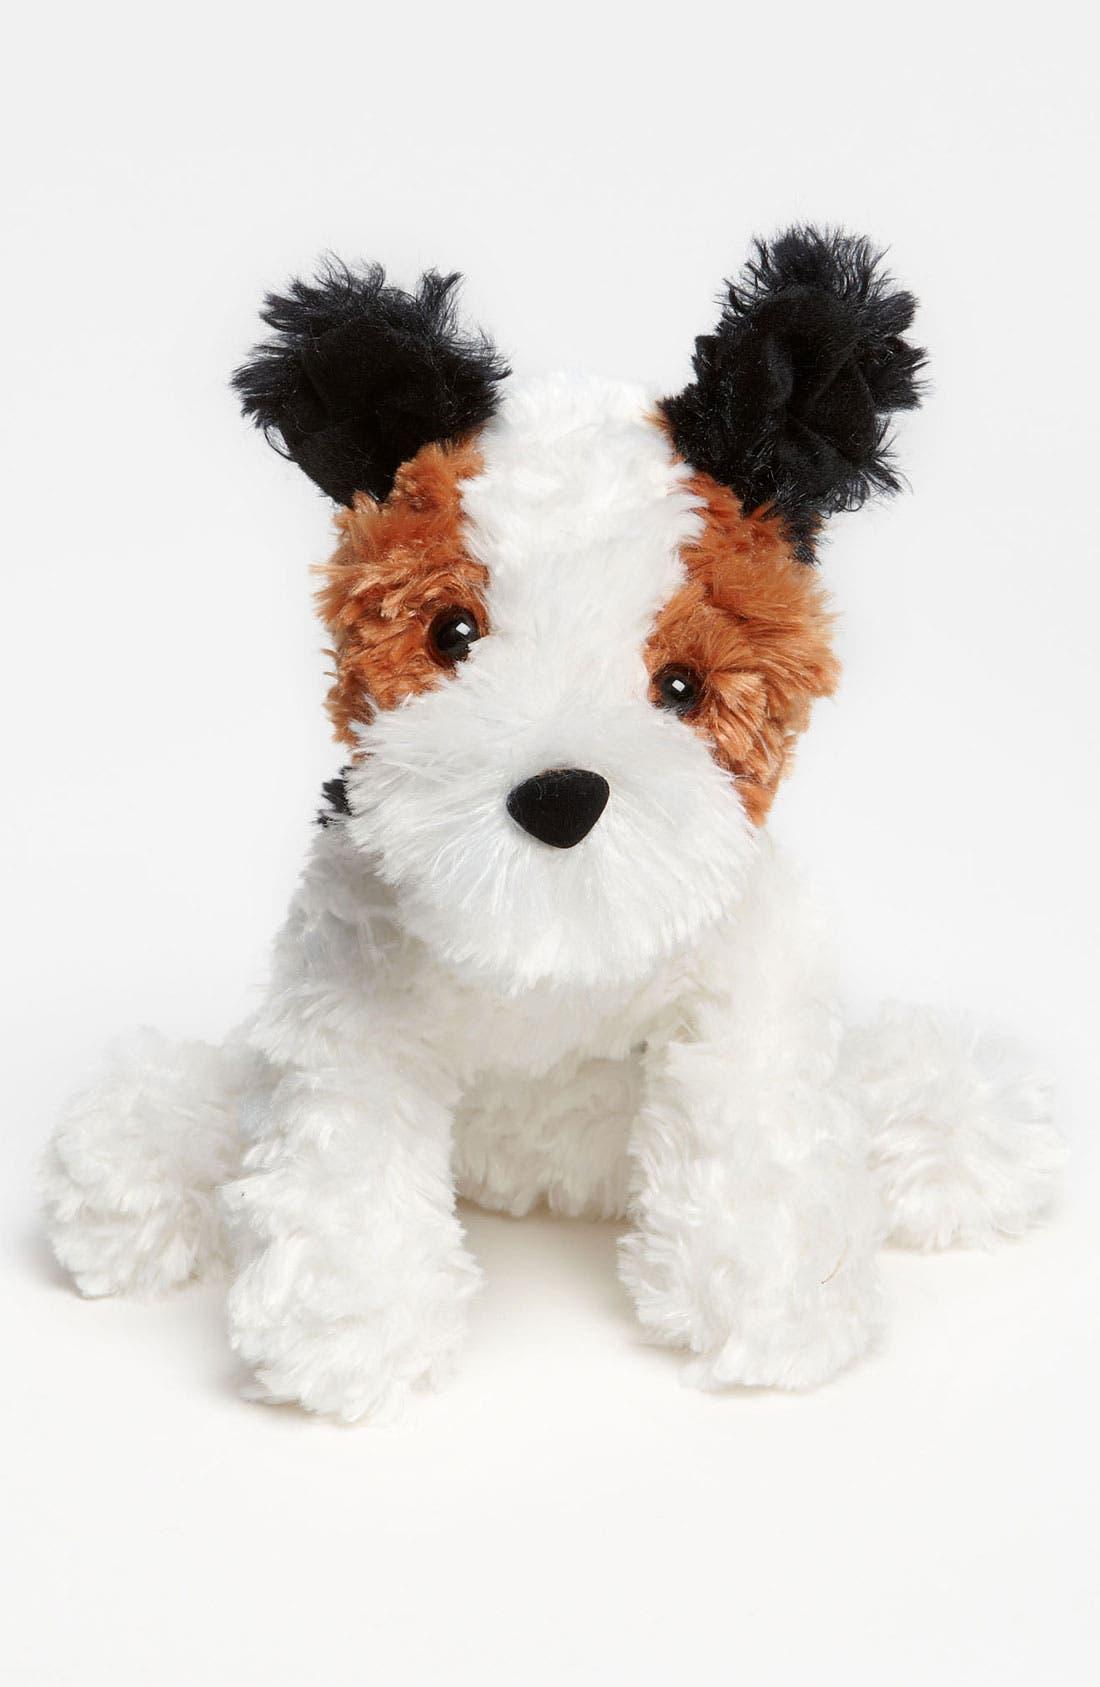 Alternate Image 1 Selected - Gund 'Tonie' Stuffed Animal